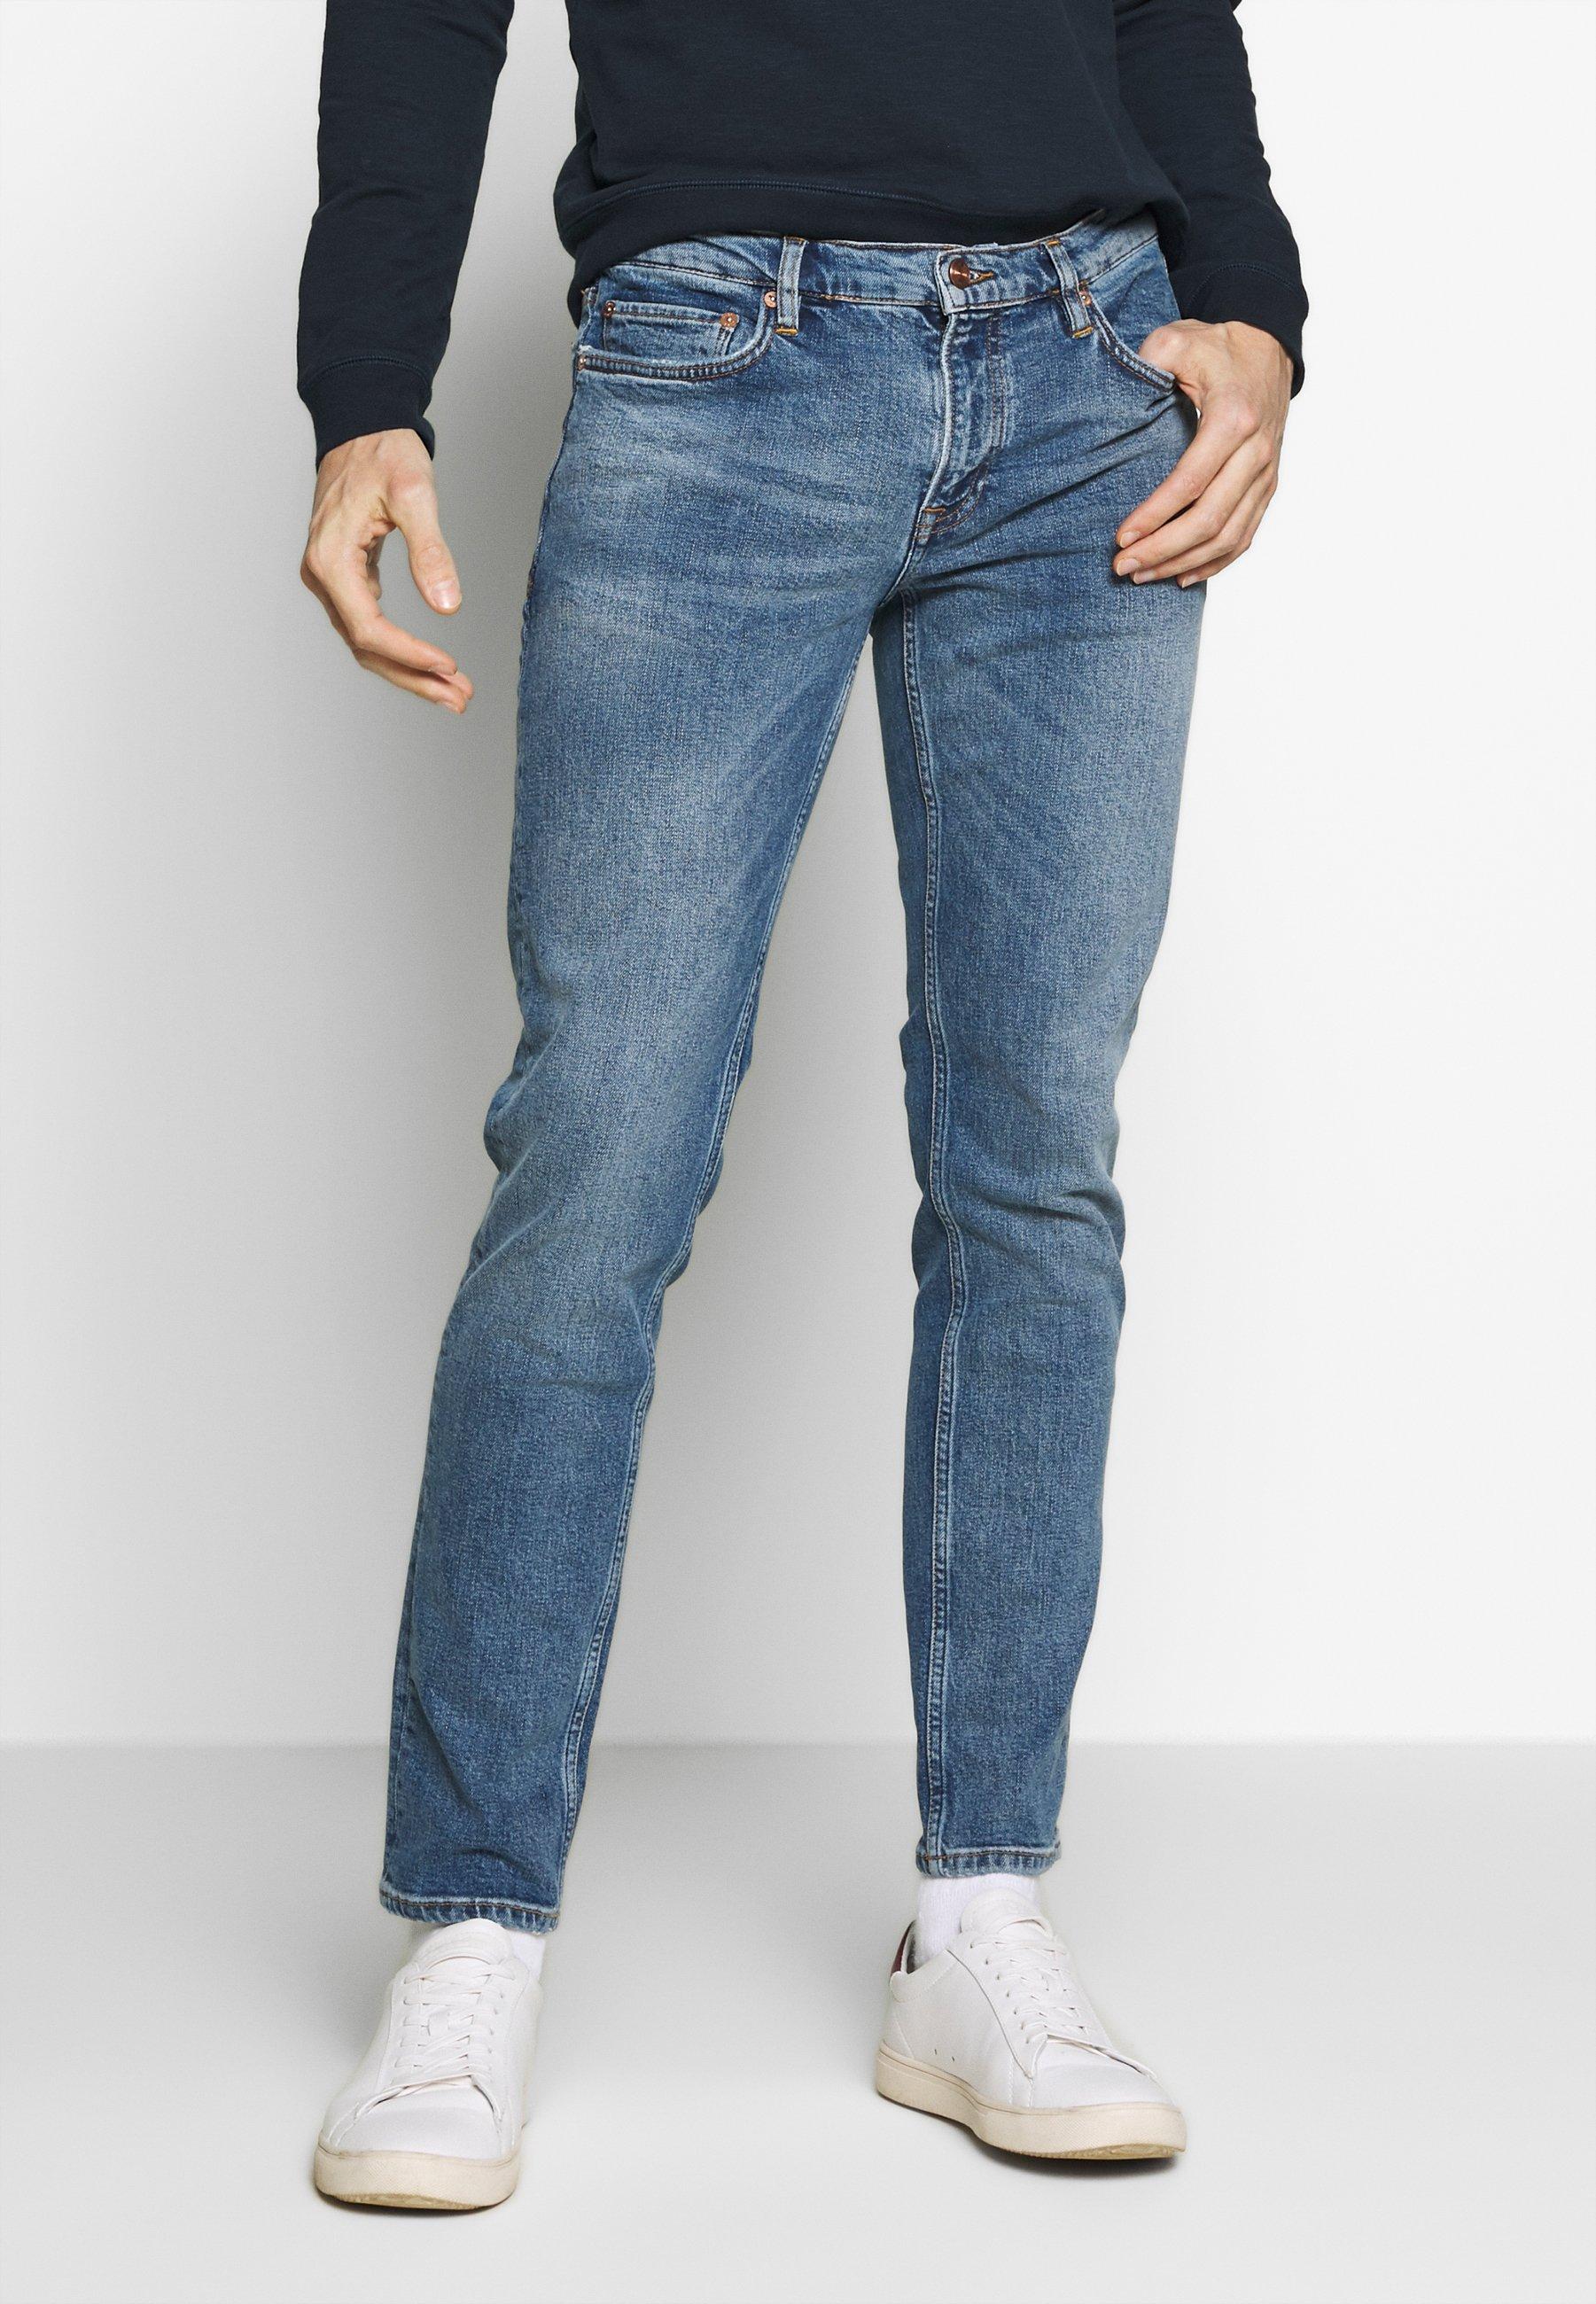 Cool Shopping Miesten vaatteet Sarja dfKJIUp97454sfGHYHD NN07 SLATER  Slim fit -farkut blue denim